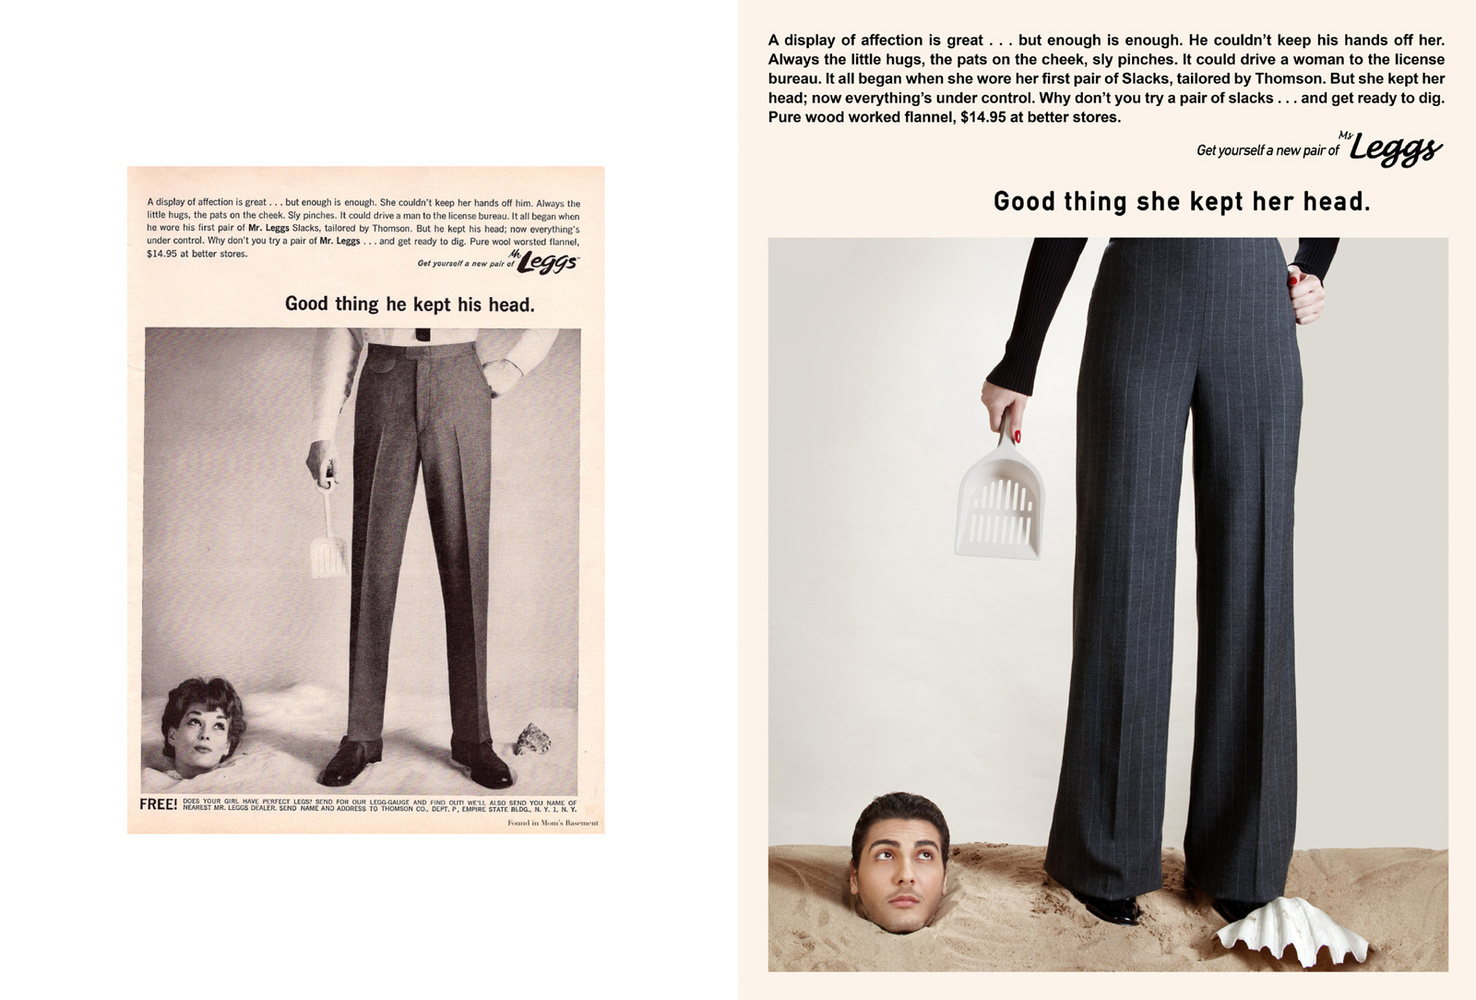 Reversed gender roles on a vintage advert